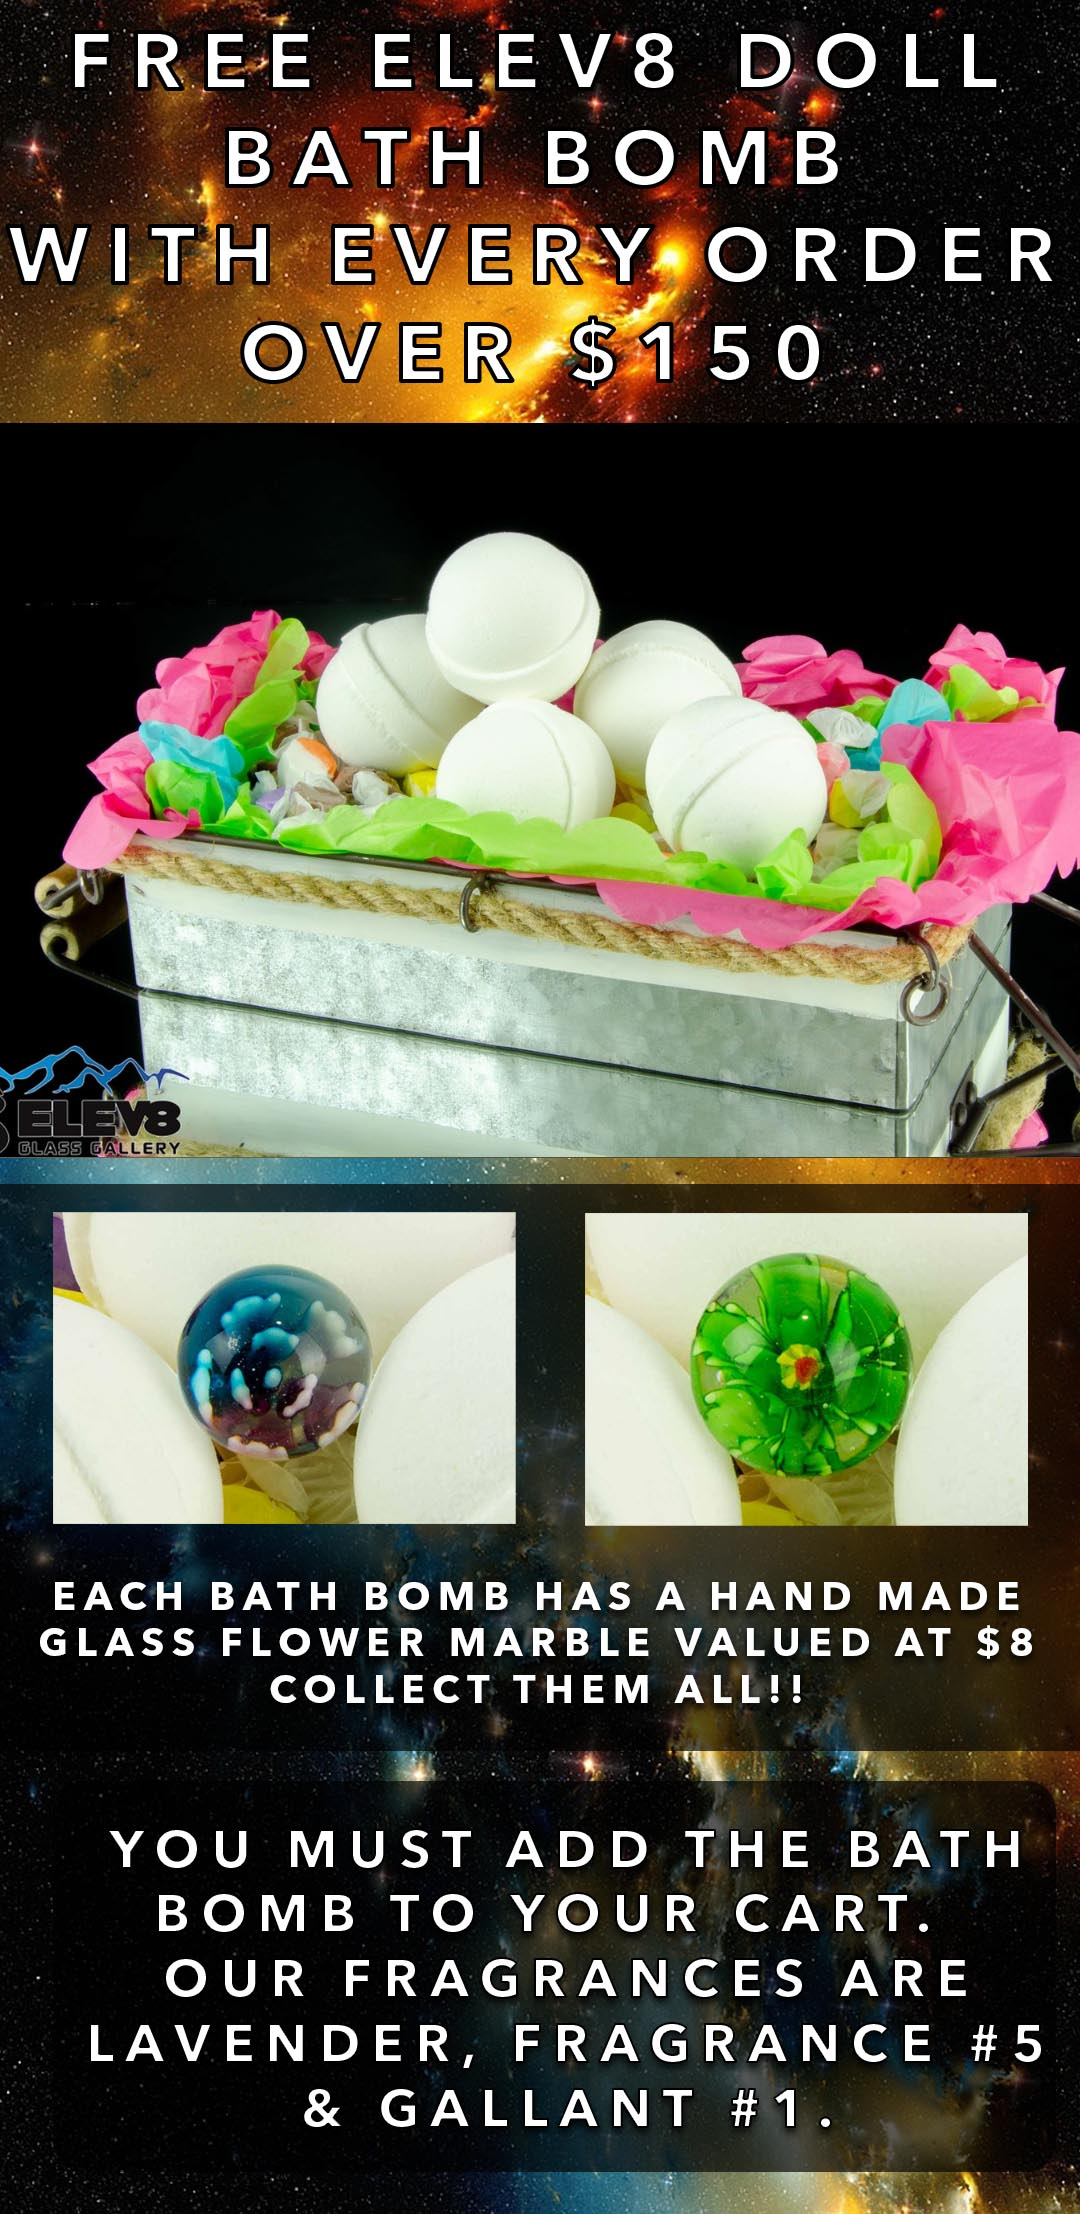 newsletter-6-29-bath-bomb.jpg